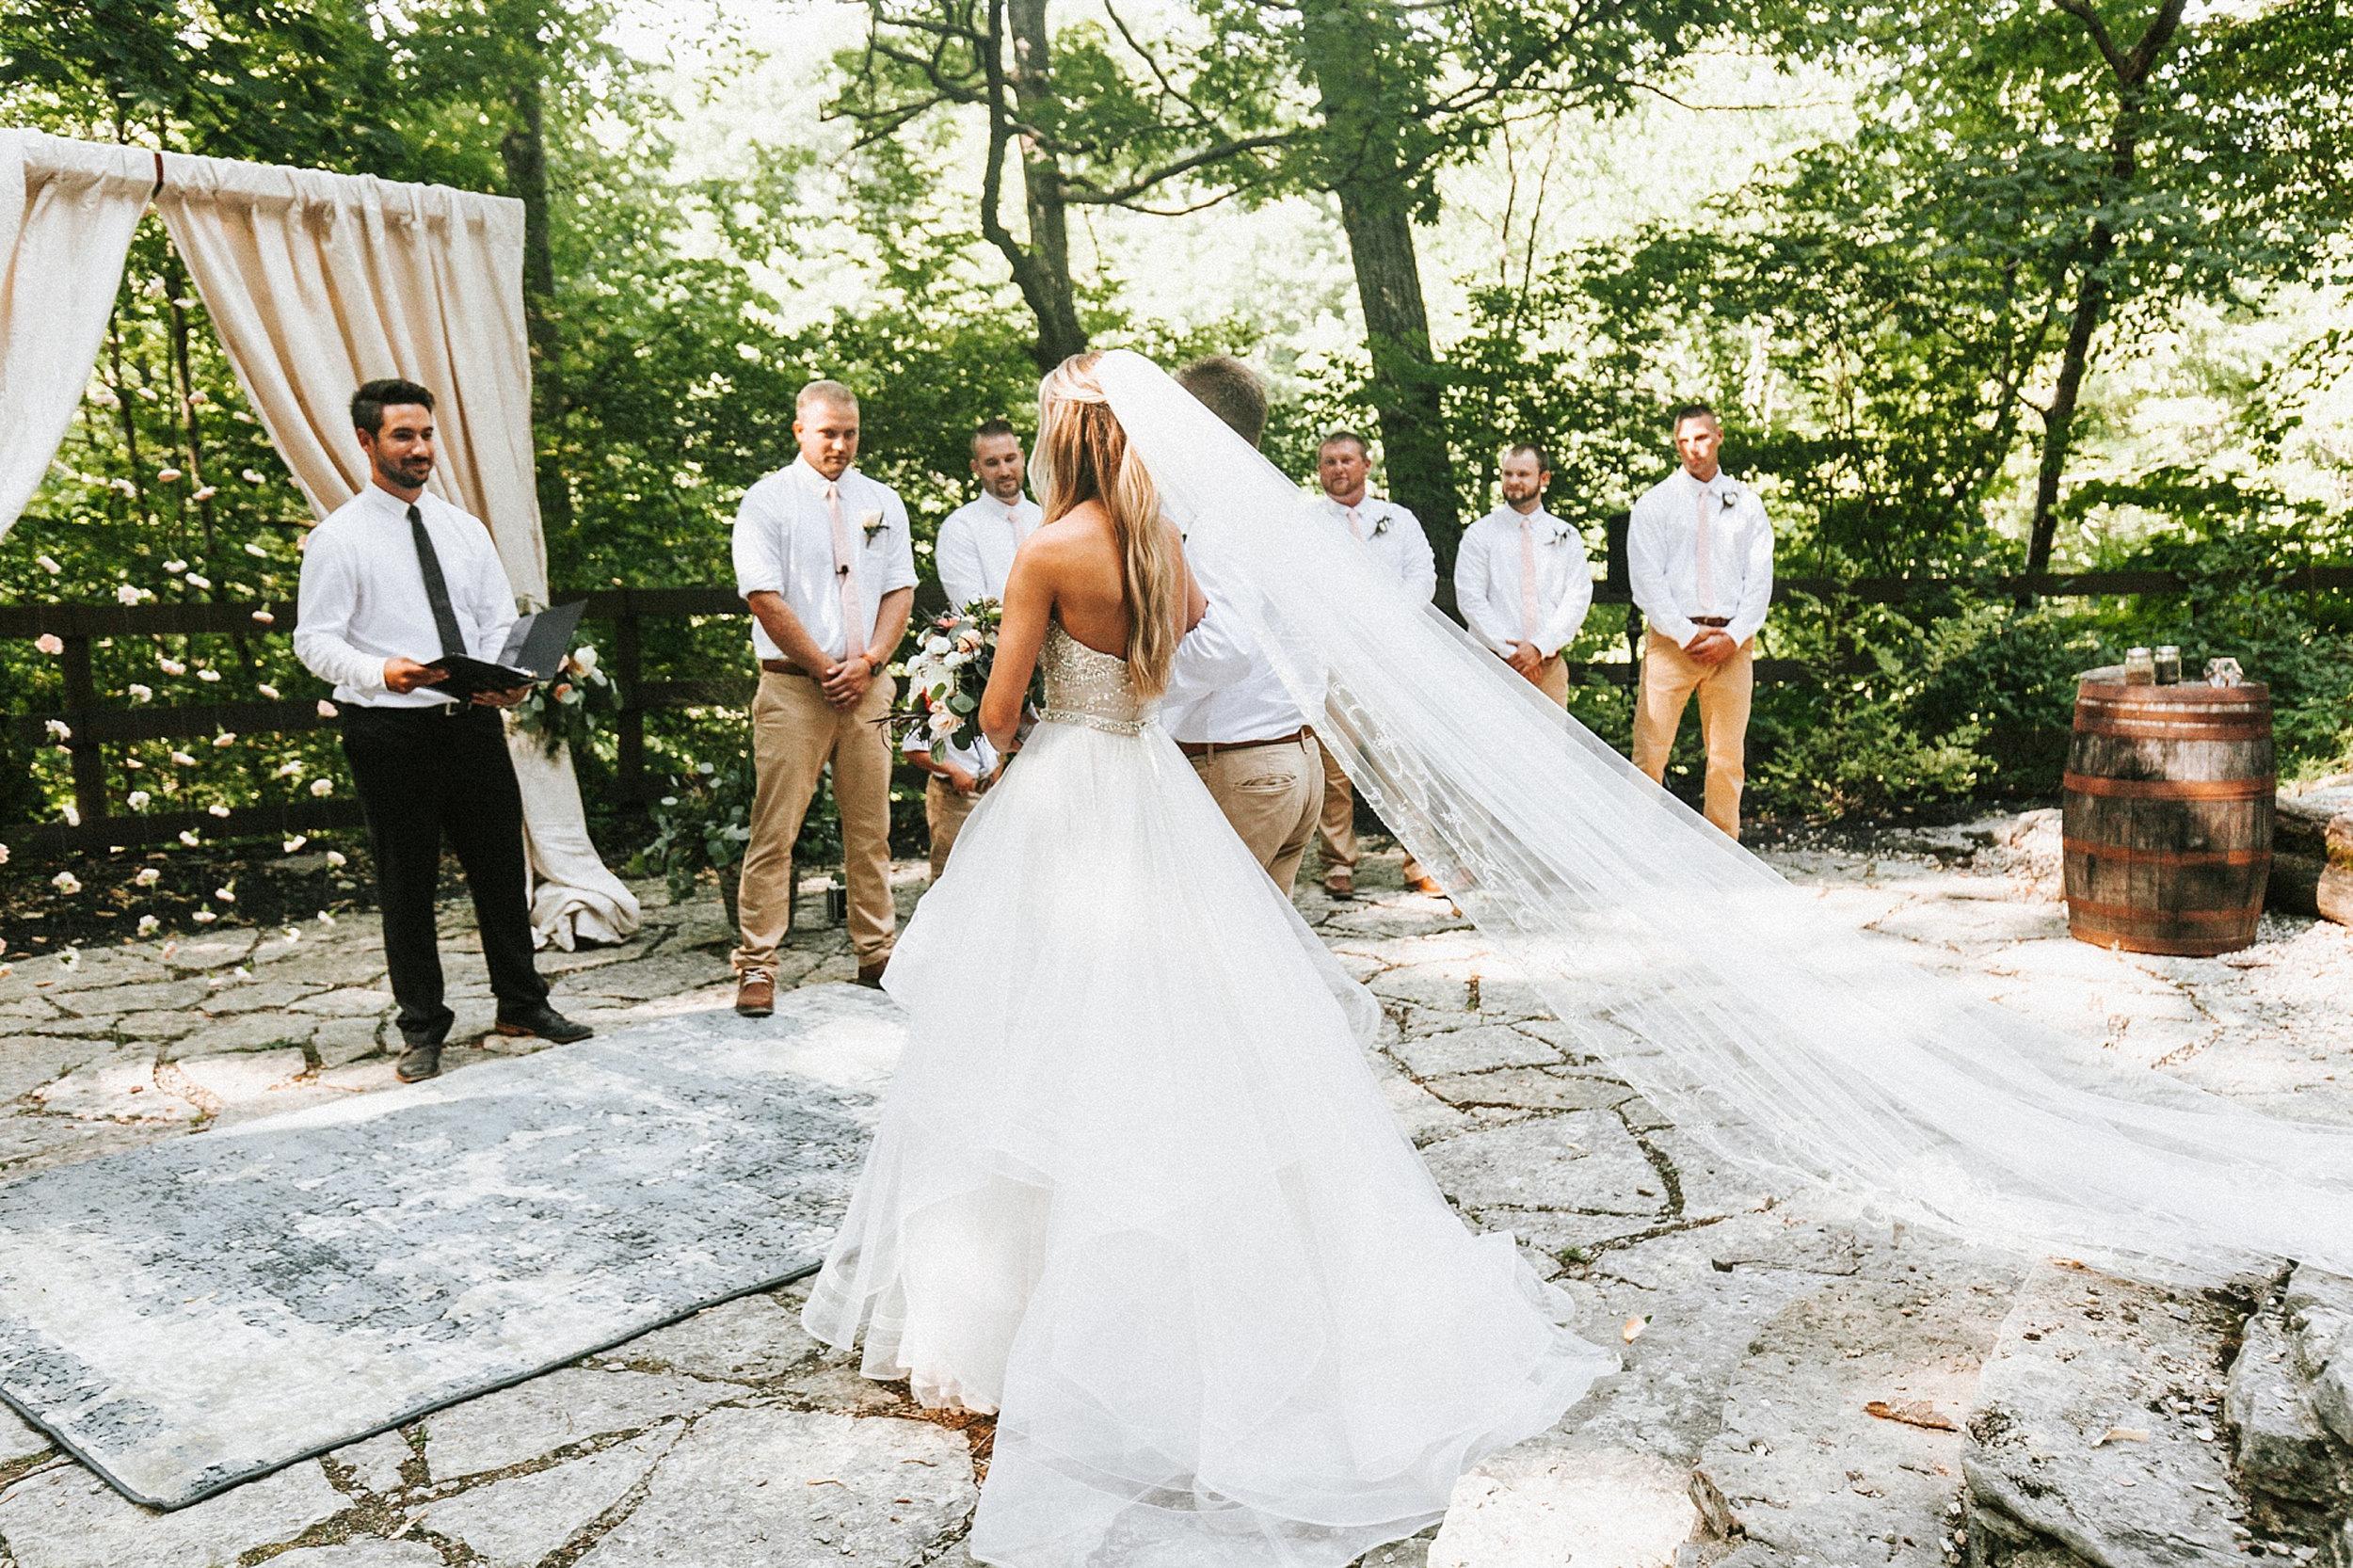 Brooke Townsend Photography - Cincinnati Wedding Photographer (73 of 153).jpg